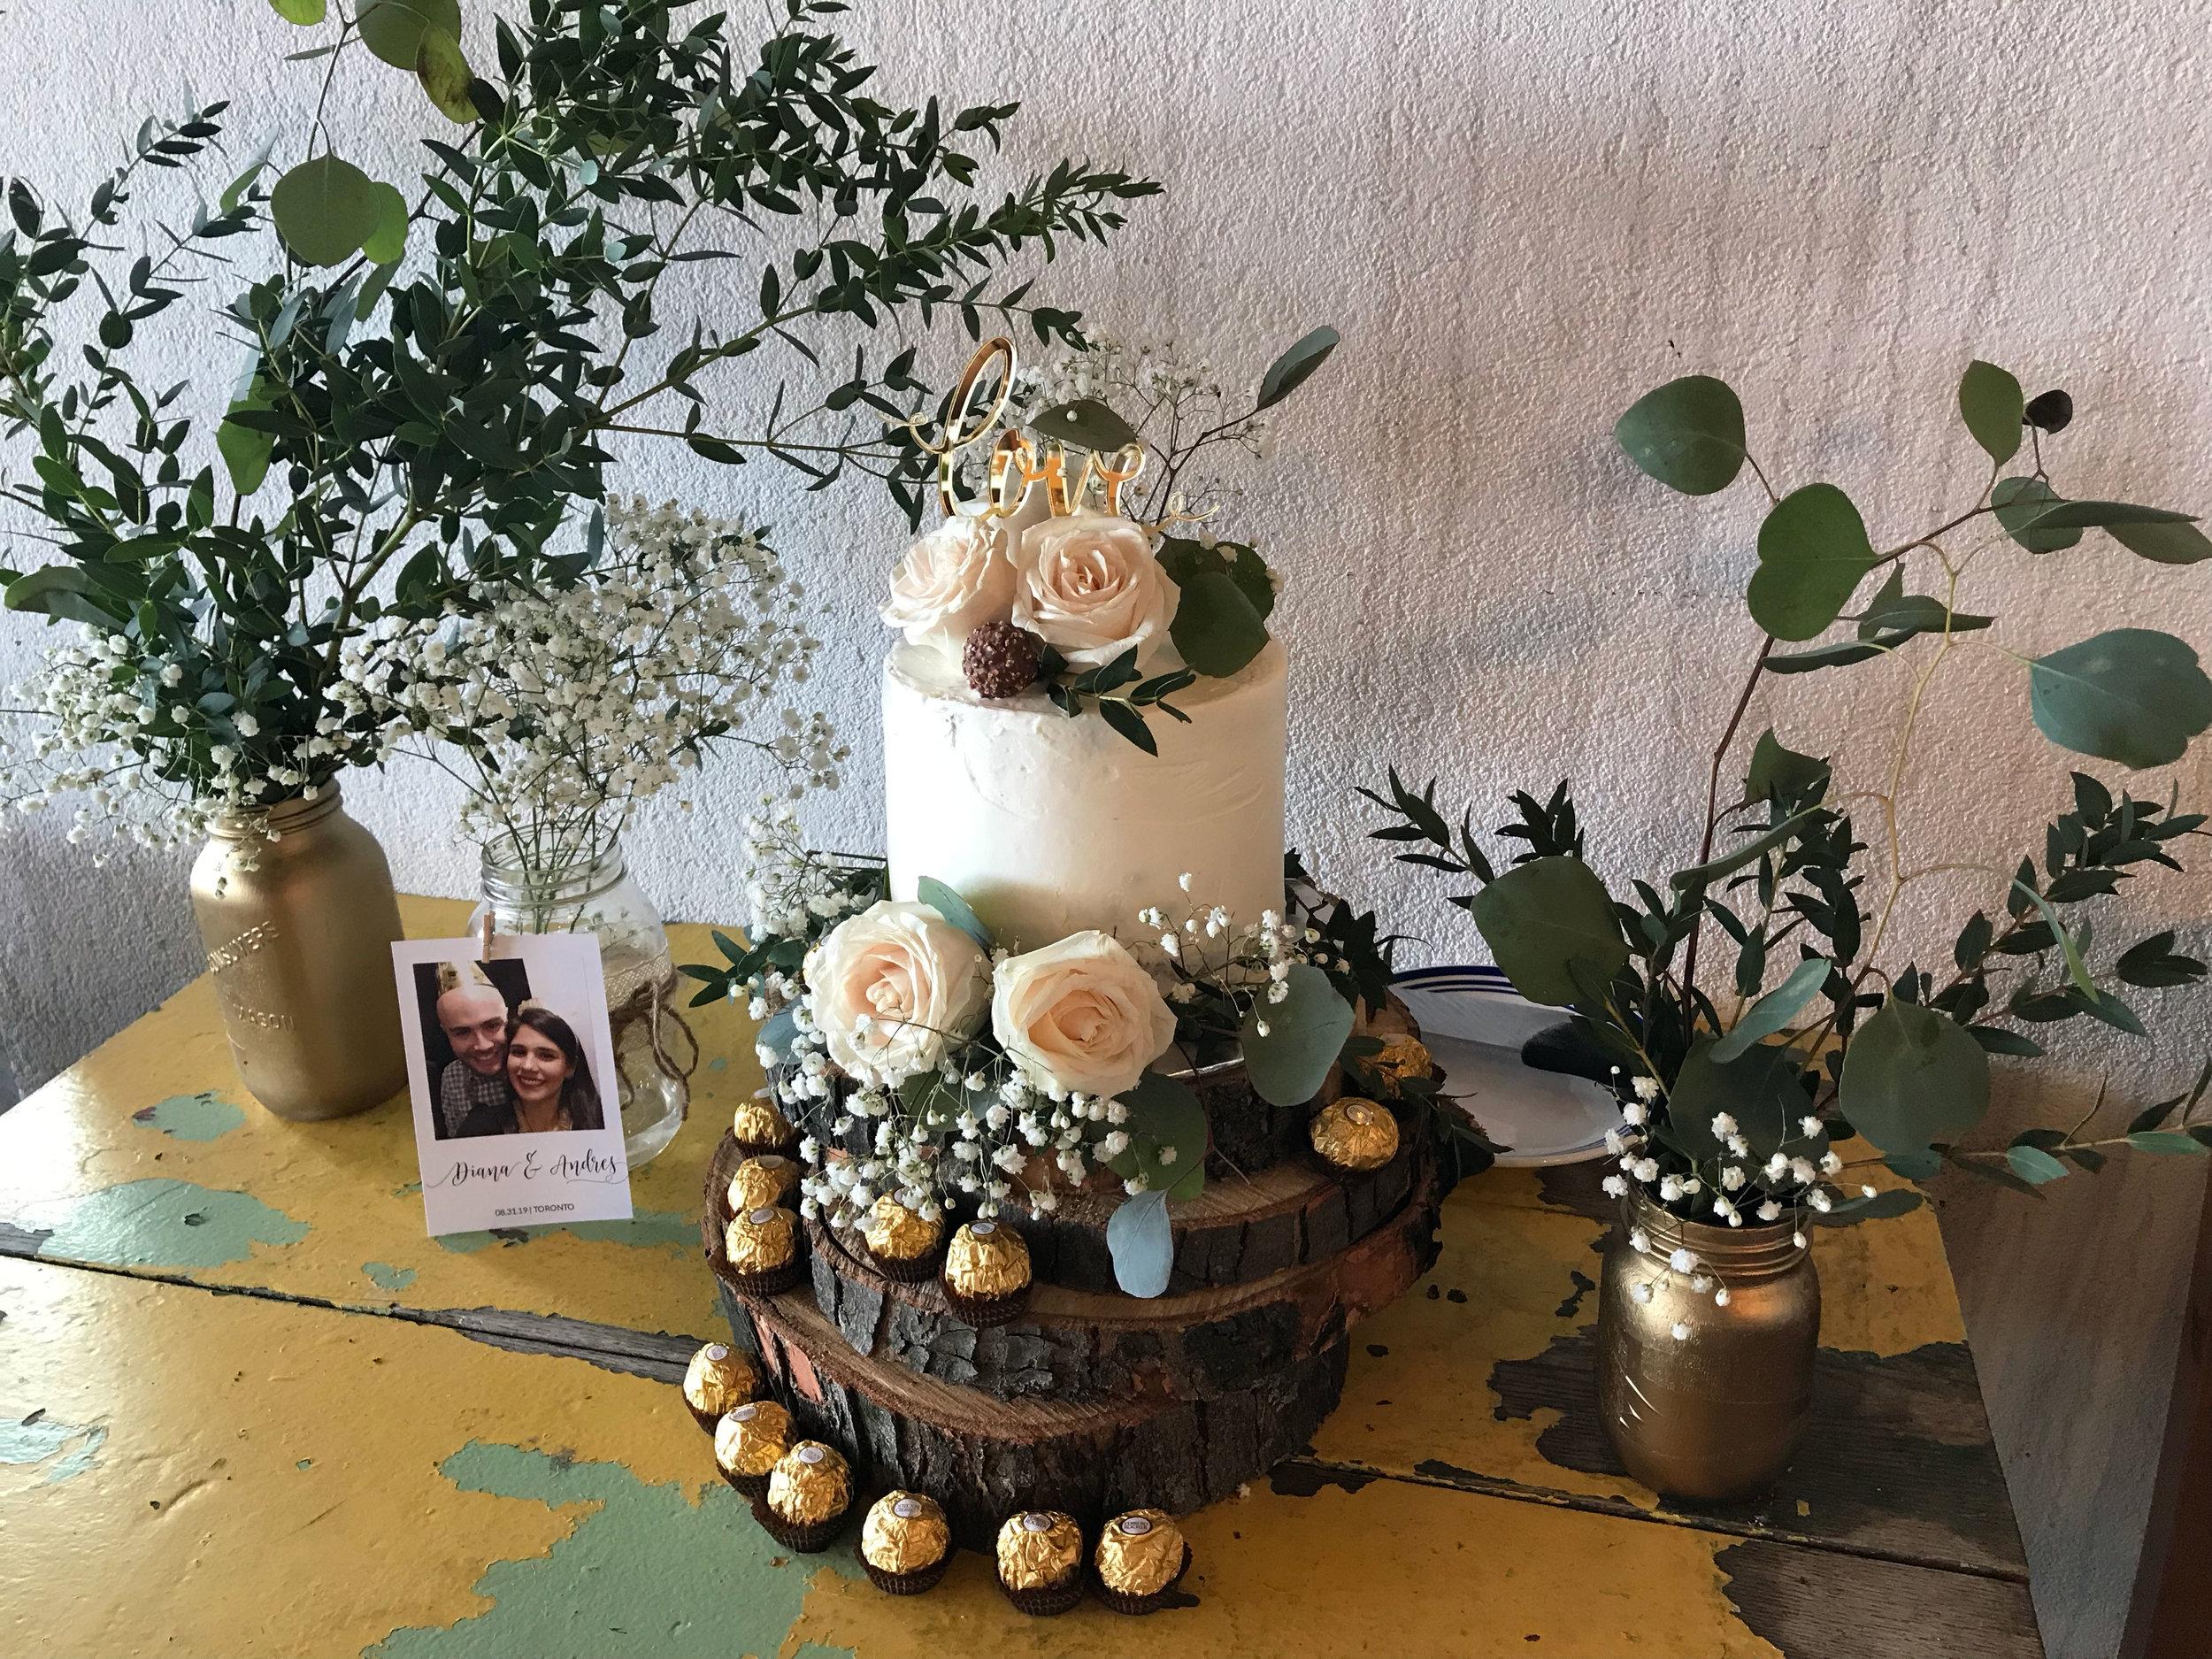 diana-andres-rustic-harvest-cake-table-naked-cake-eucalyptus-wooden-discs-ferrero-rocher-cake-topper-love-polaroid-mason-jar-centerpeices-greenery-tyscany-wedding-2.jpg